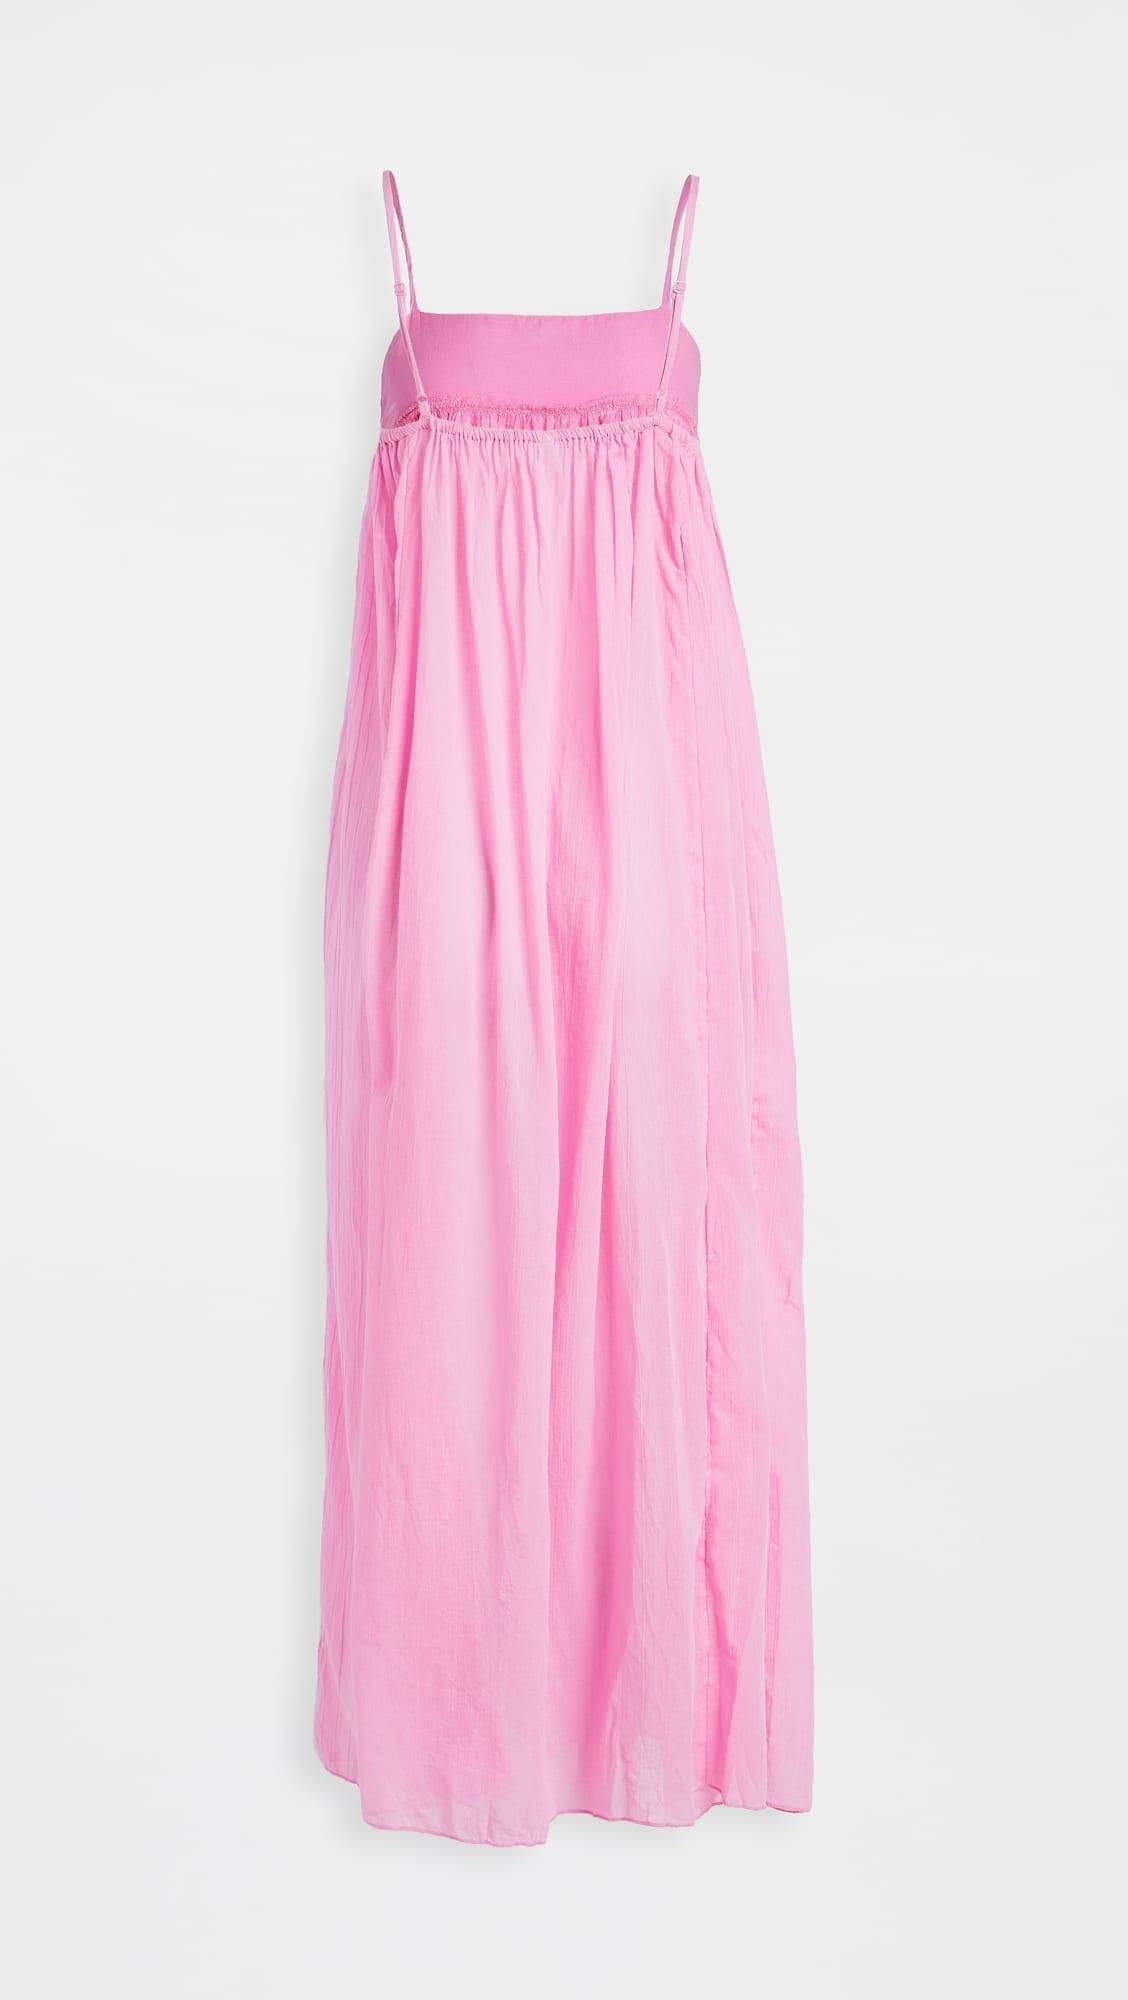 FREE PEOPLE On My Own Maxi Slip Dress